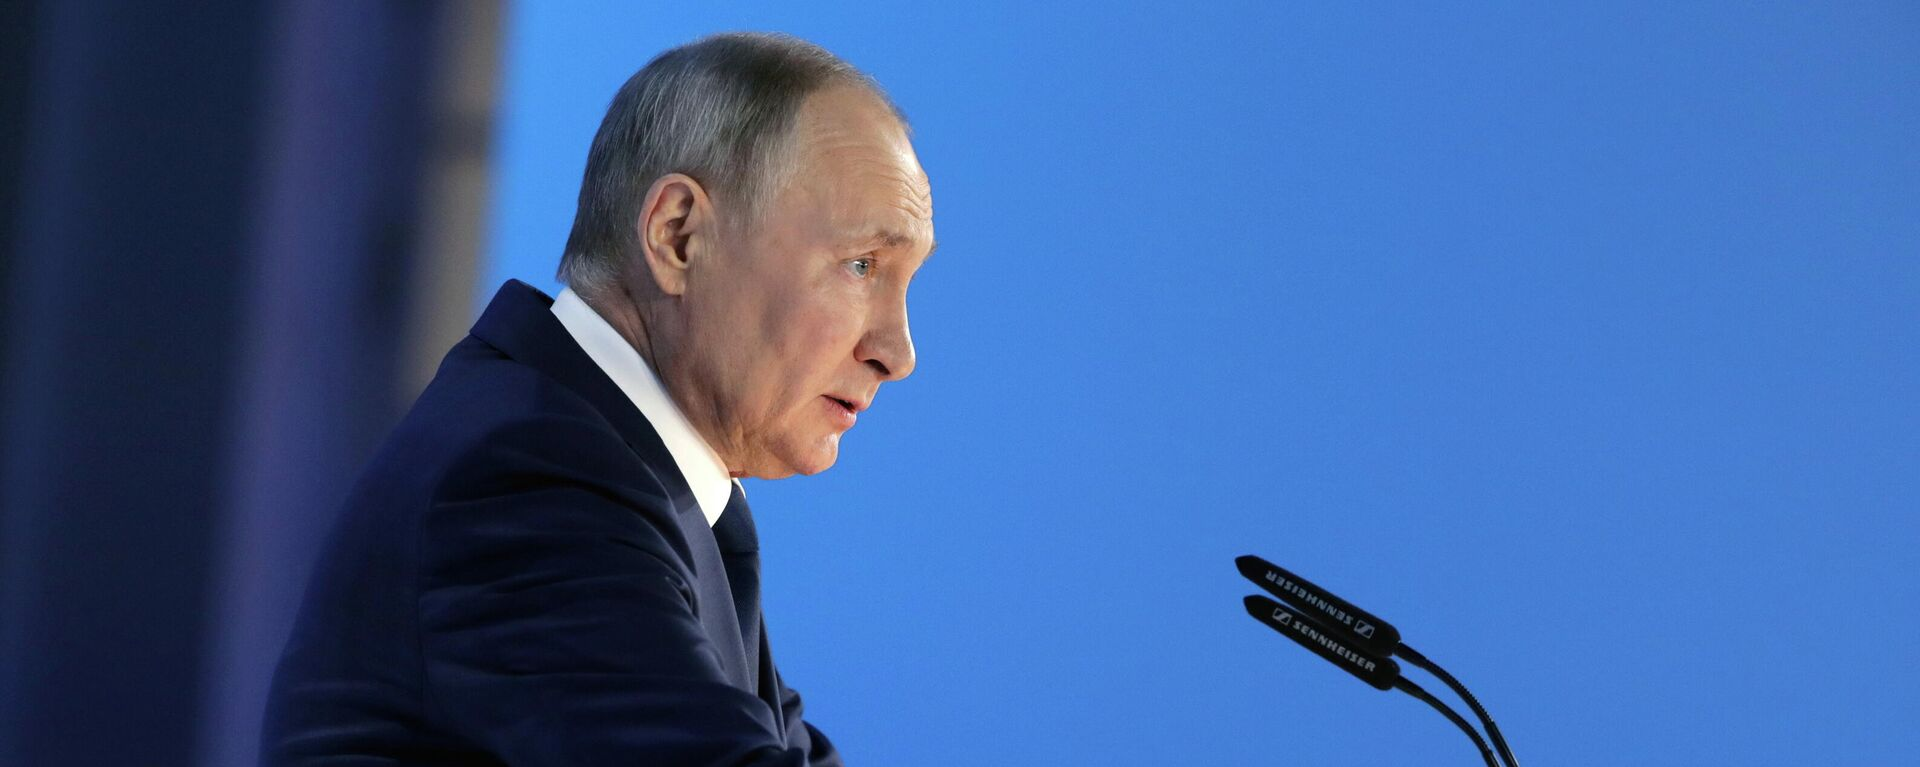 El presidente de Rusia, Vladímir Putin, dirige su mensaje anual a la Asamblea Federal - Sputnik Mundo, 1920, 07.06.2021